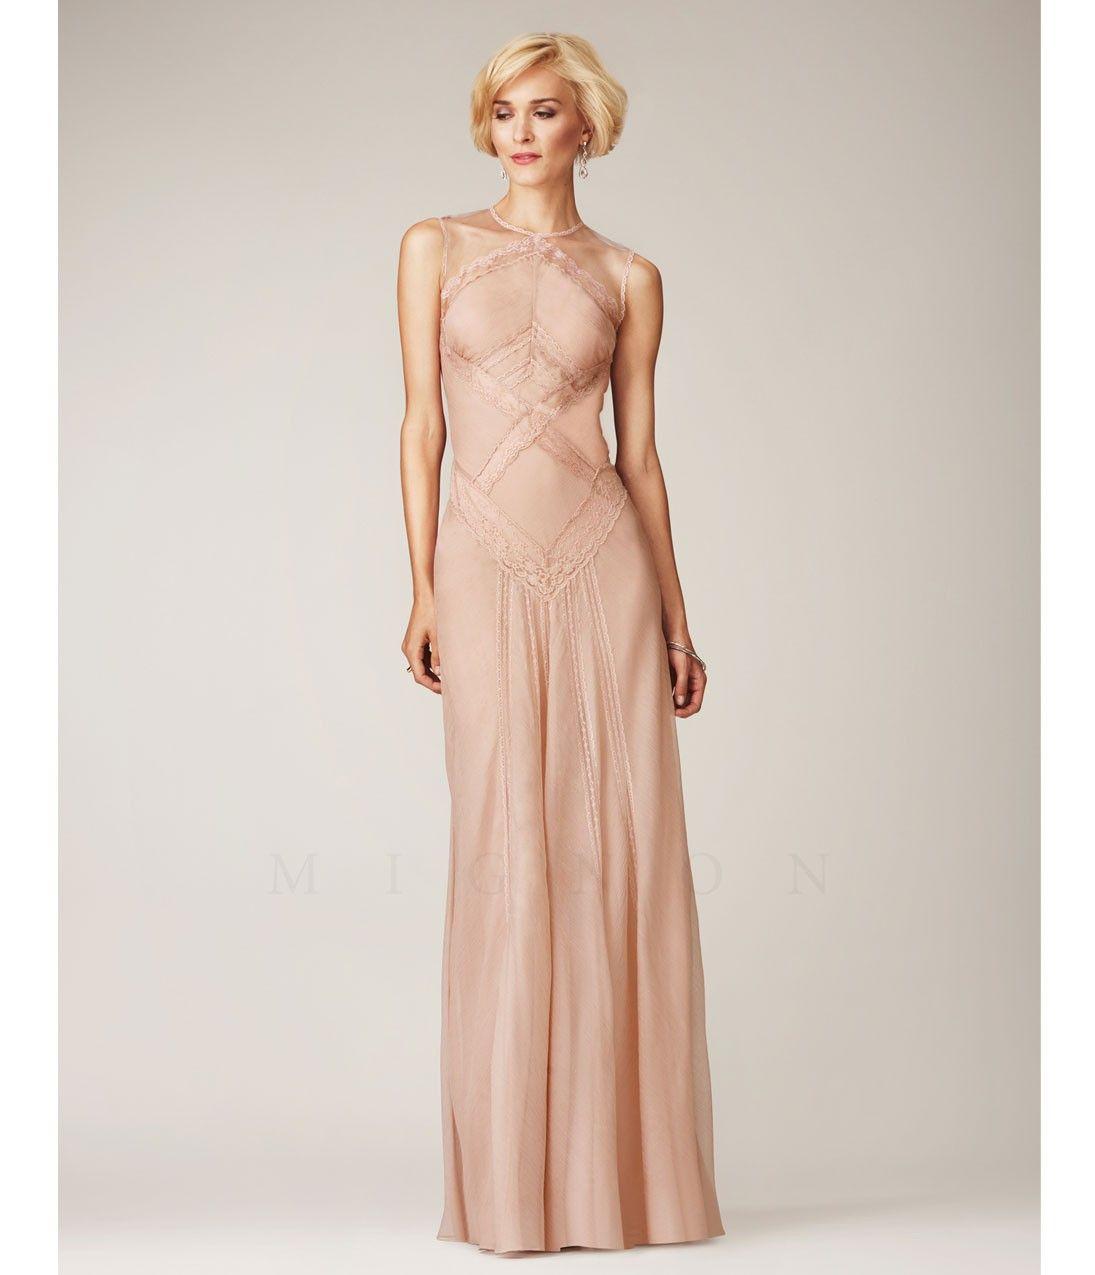 Camo and orange wedding dresses  Tearose Cross Lace Sheer Sleeveless Prom Dress  Dreamy Pink